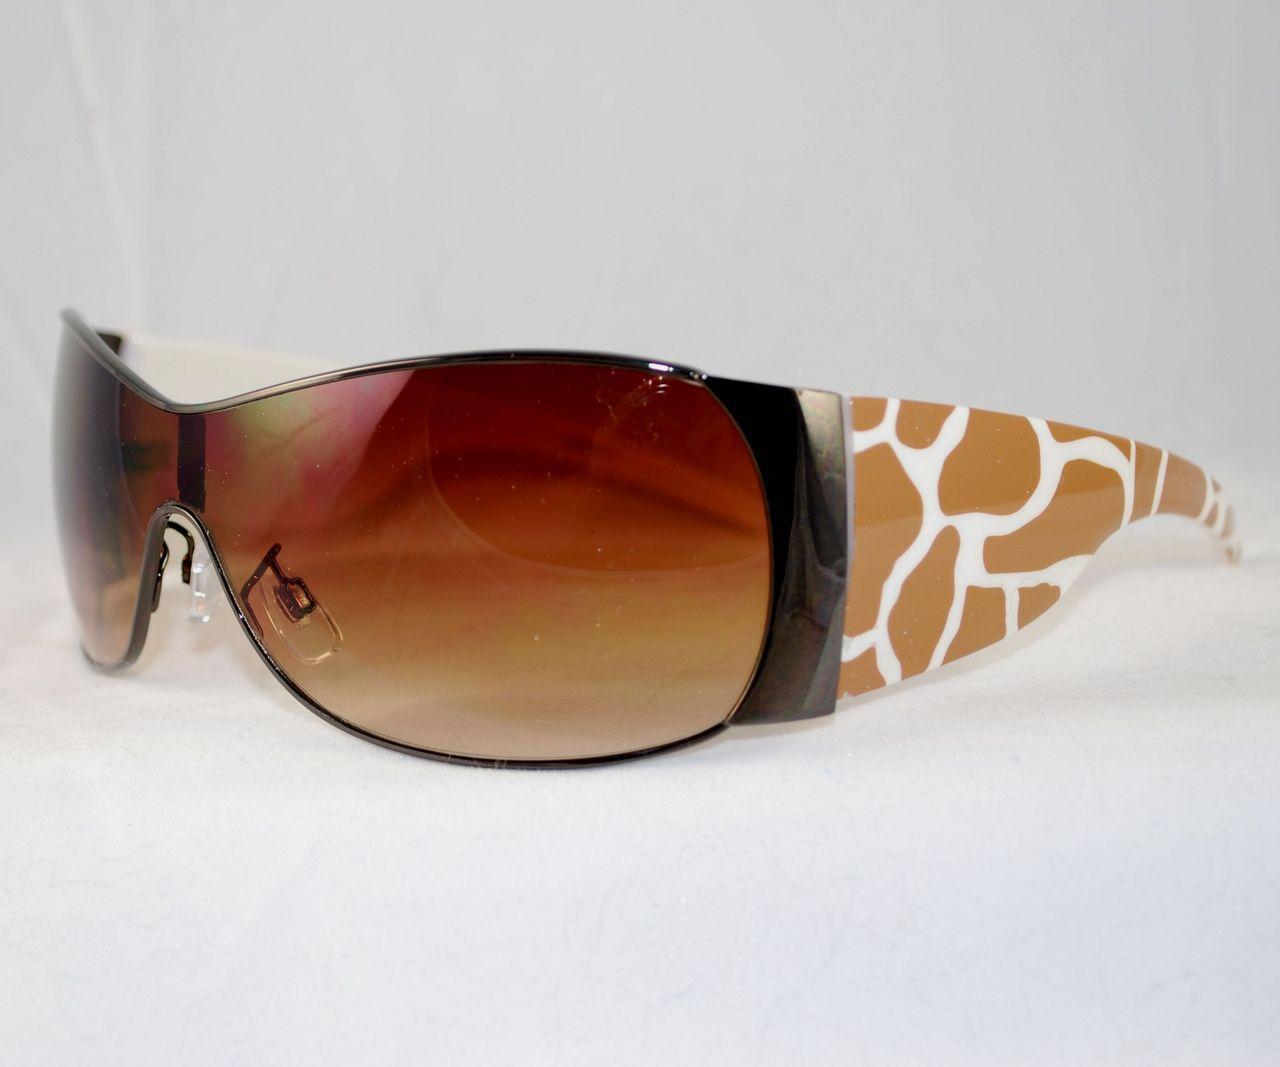 "Enchanting Jewelry Creations - ""Uni-Lens Giraffe Print Sunglasses"". ($18.00) (http://stores.enchantingjewelrycreations.com/uni-lens-giraffe-print-sunglasses/)"